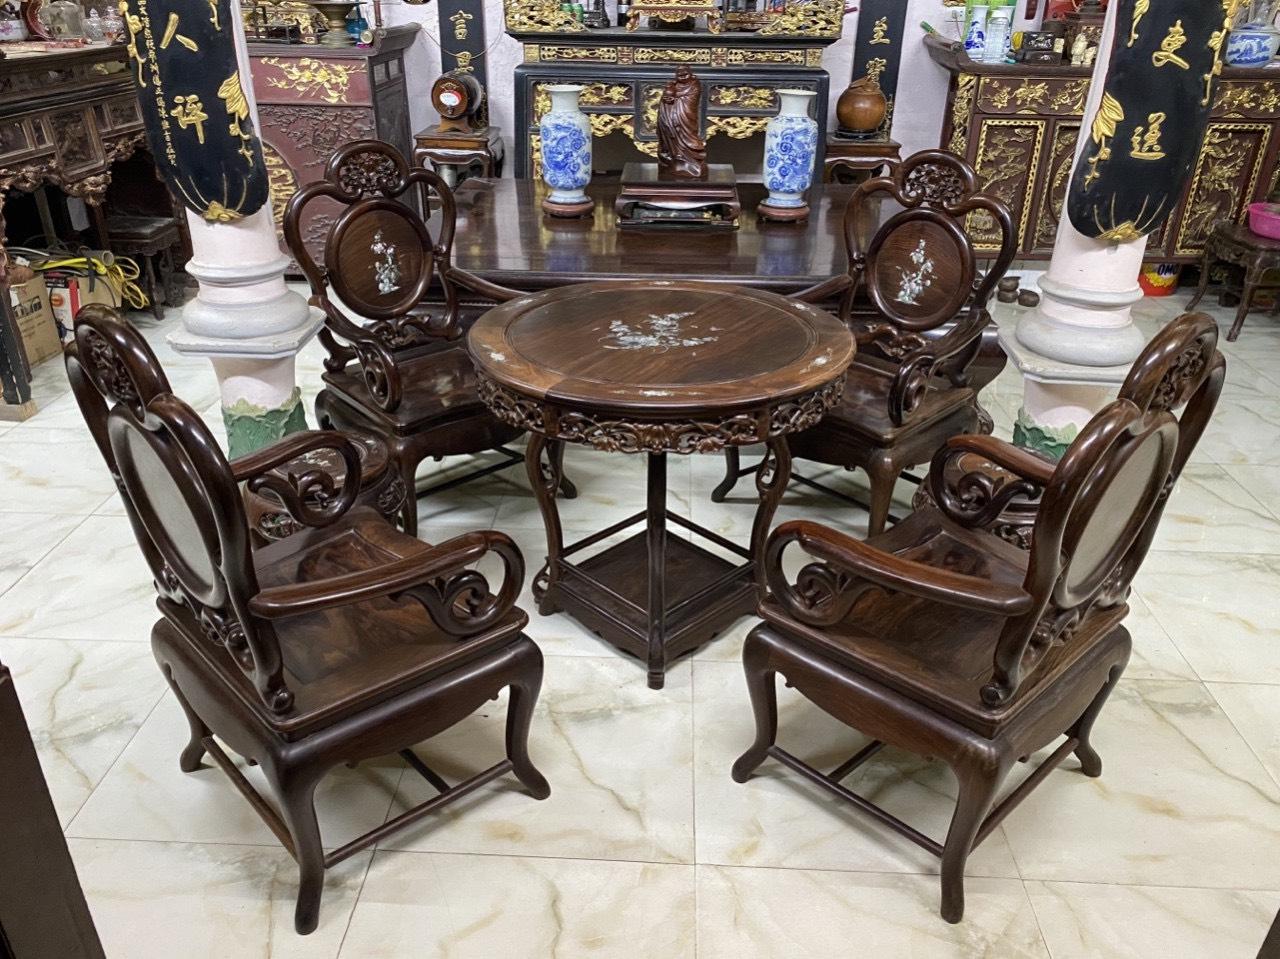 thu mua bàn tròn gỗ trắc cũ